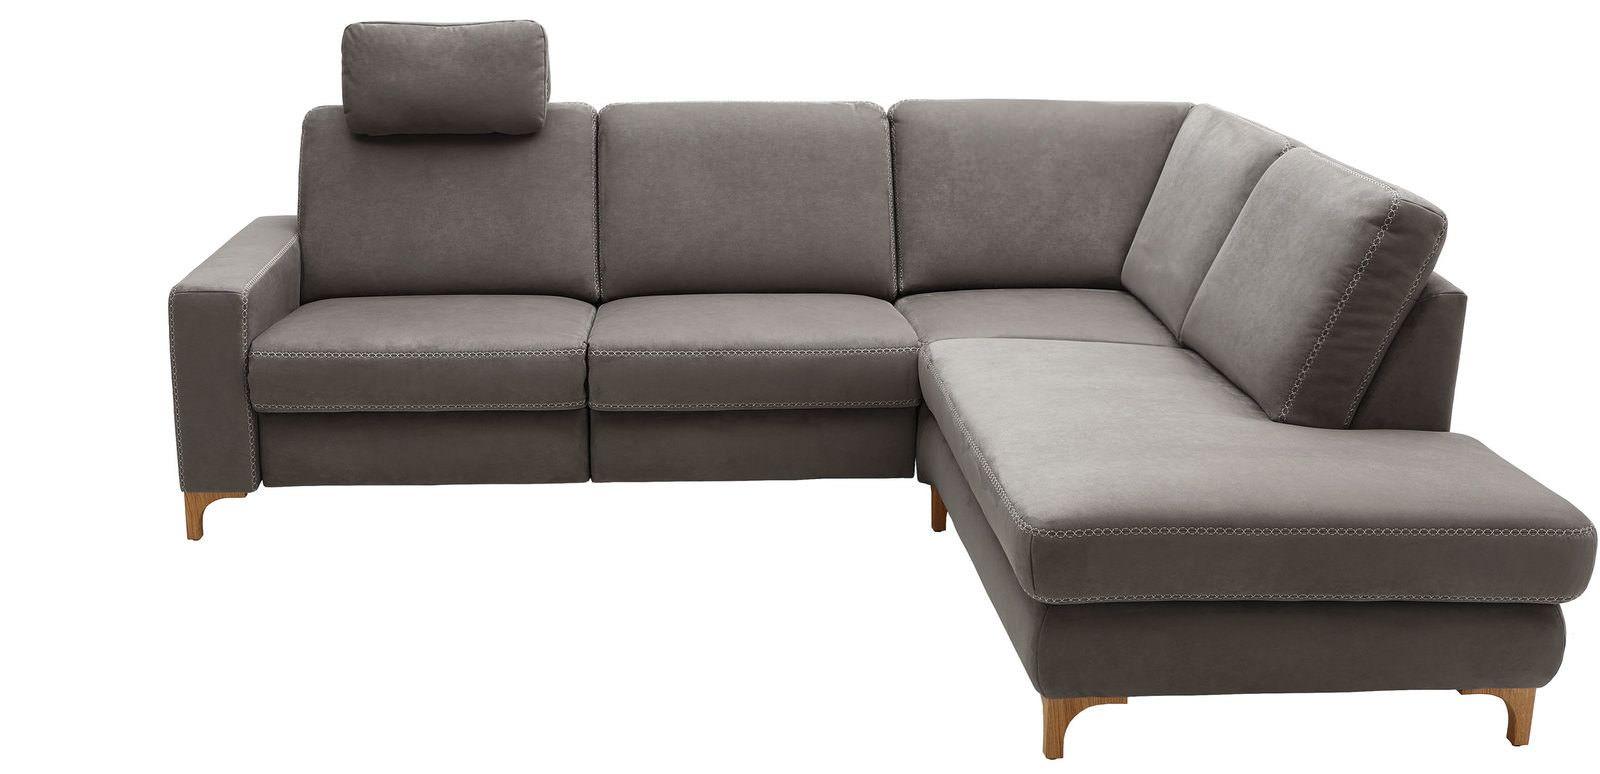 Bemerkenswert Polstergarnituren 3 2 1 Sitzer Sectional Couch Decor Couch